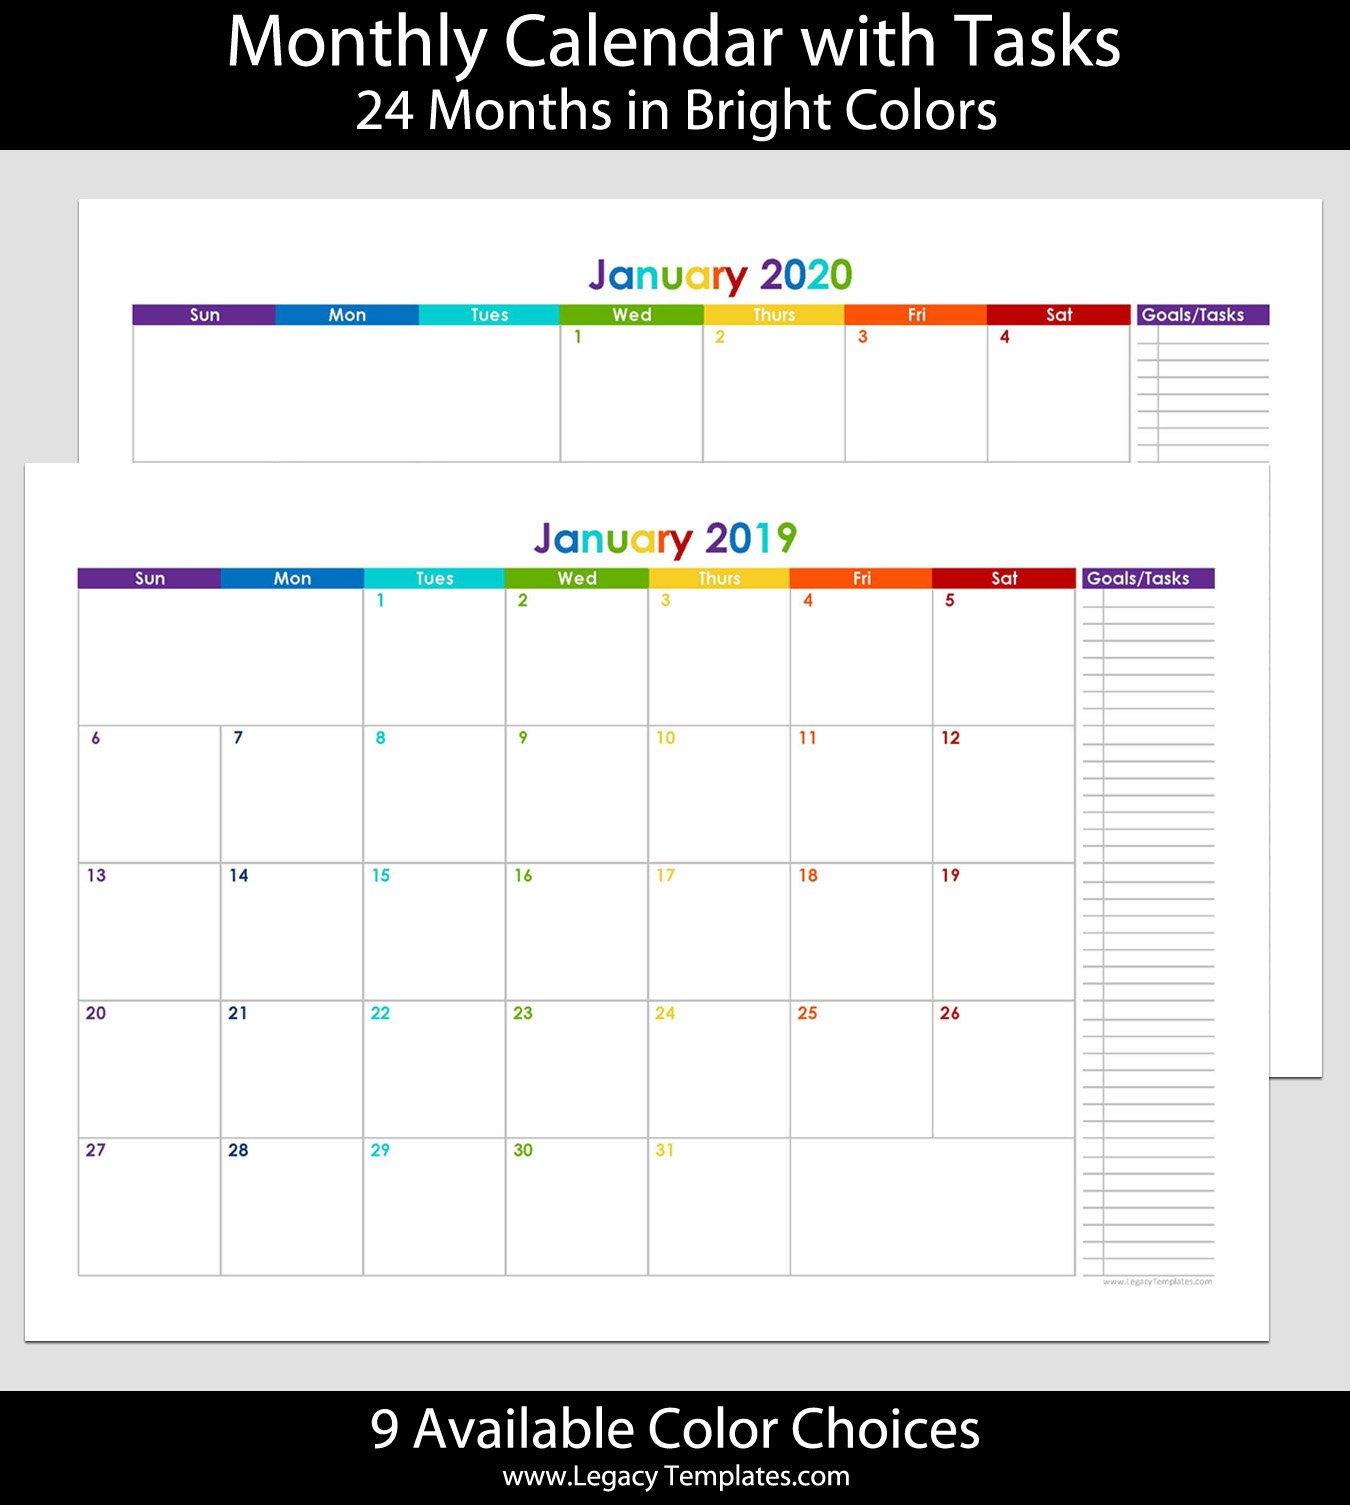 2019 & 2020 24 Month Landscape Calendar With Tasks – A4 2 Page Printable Monthly Calendar